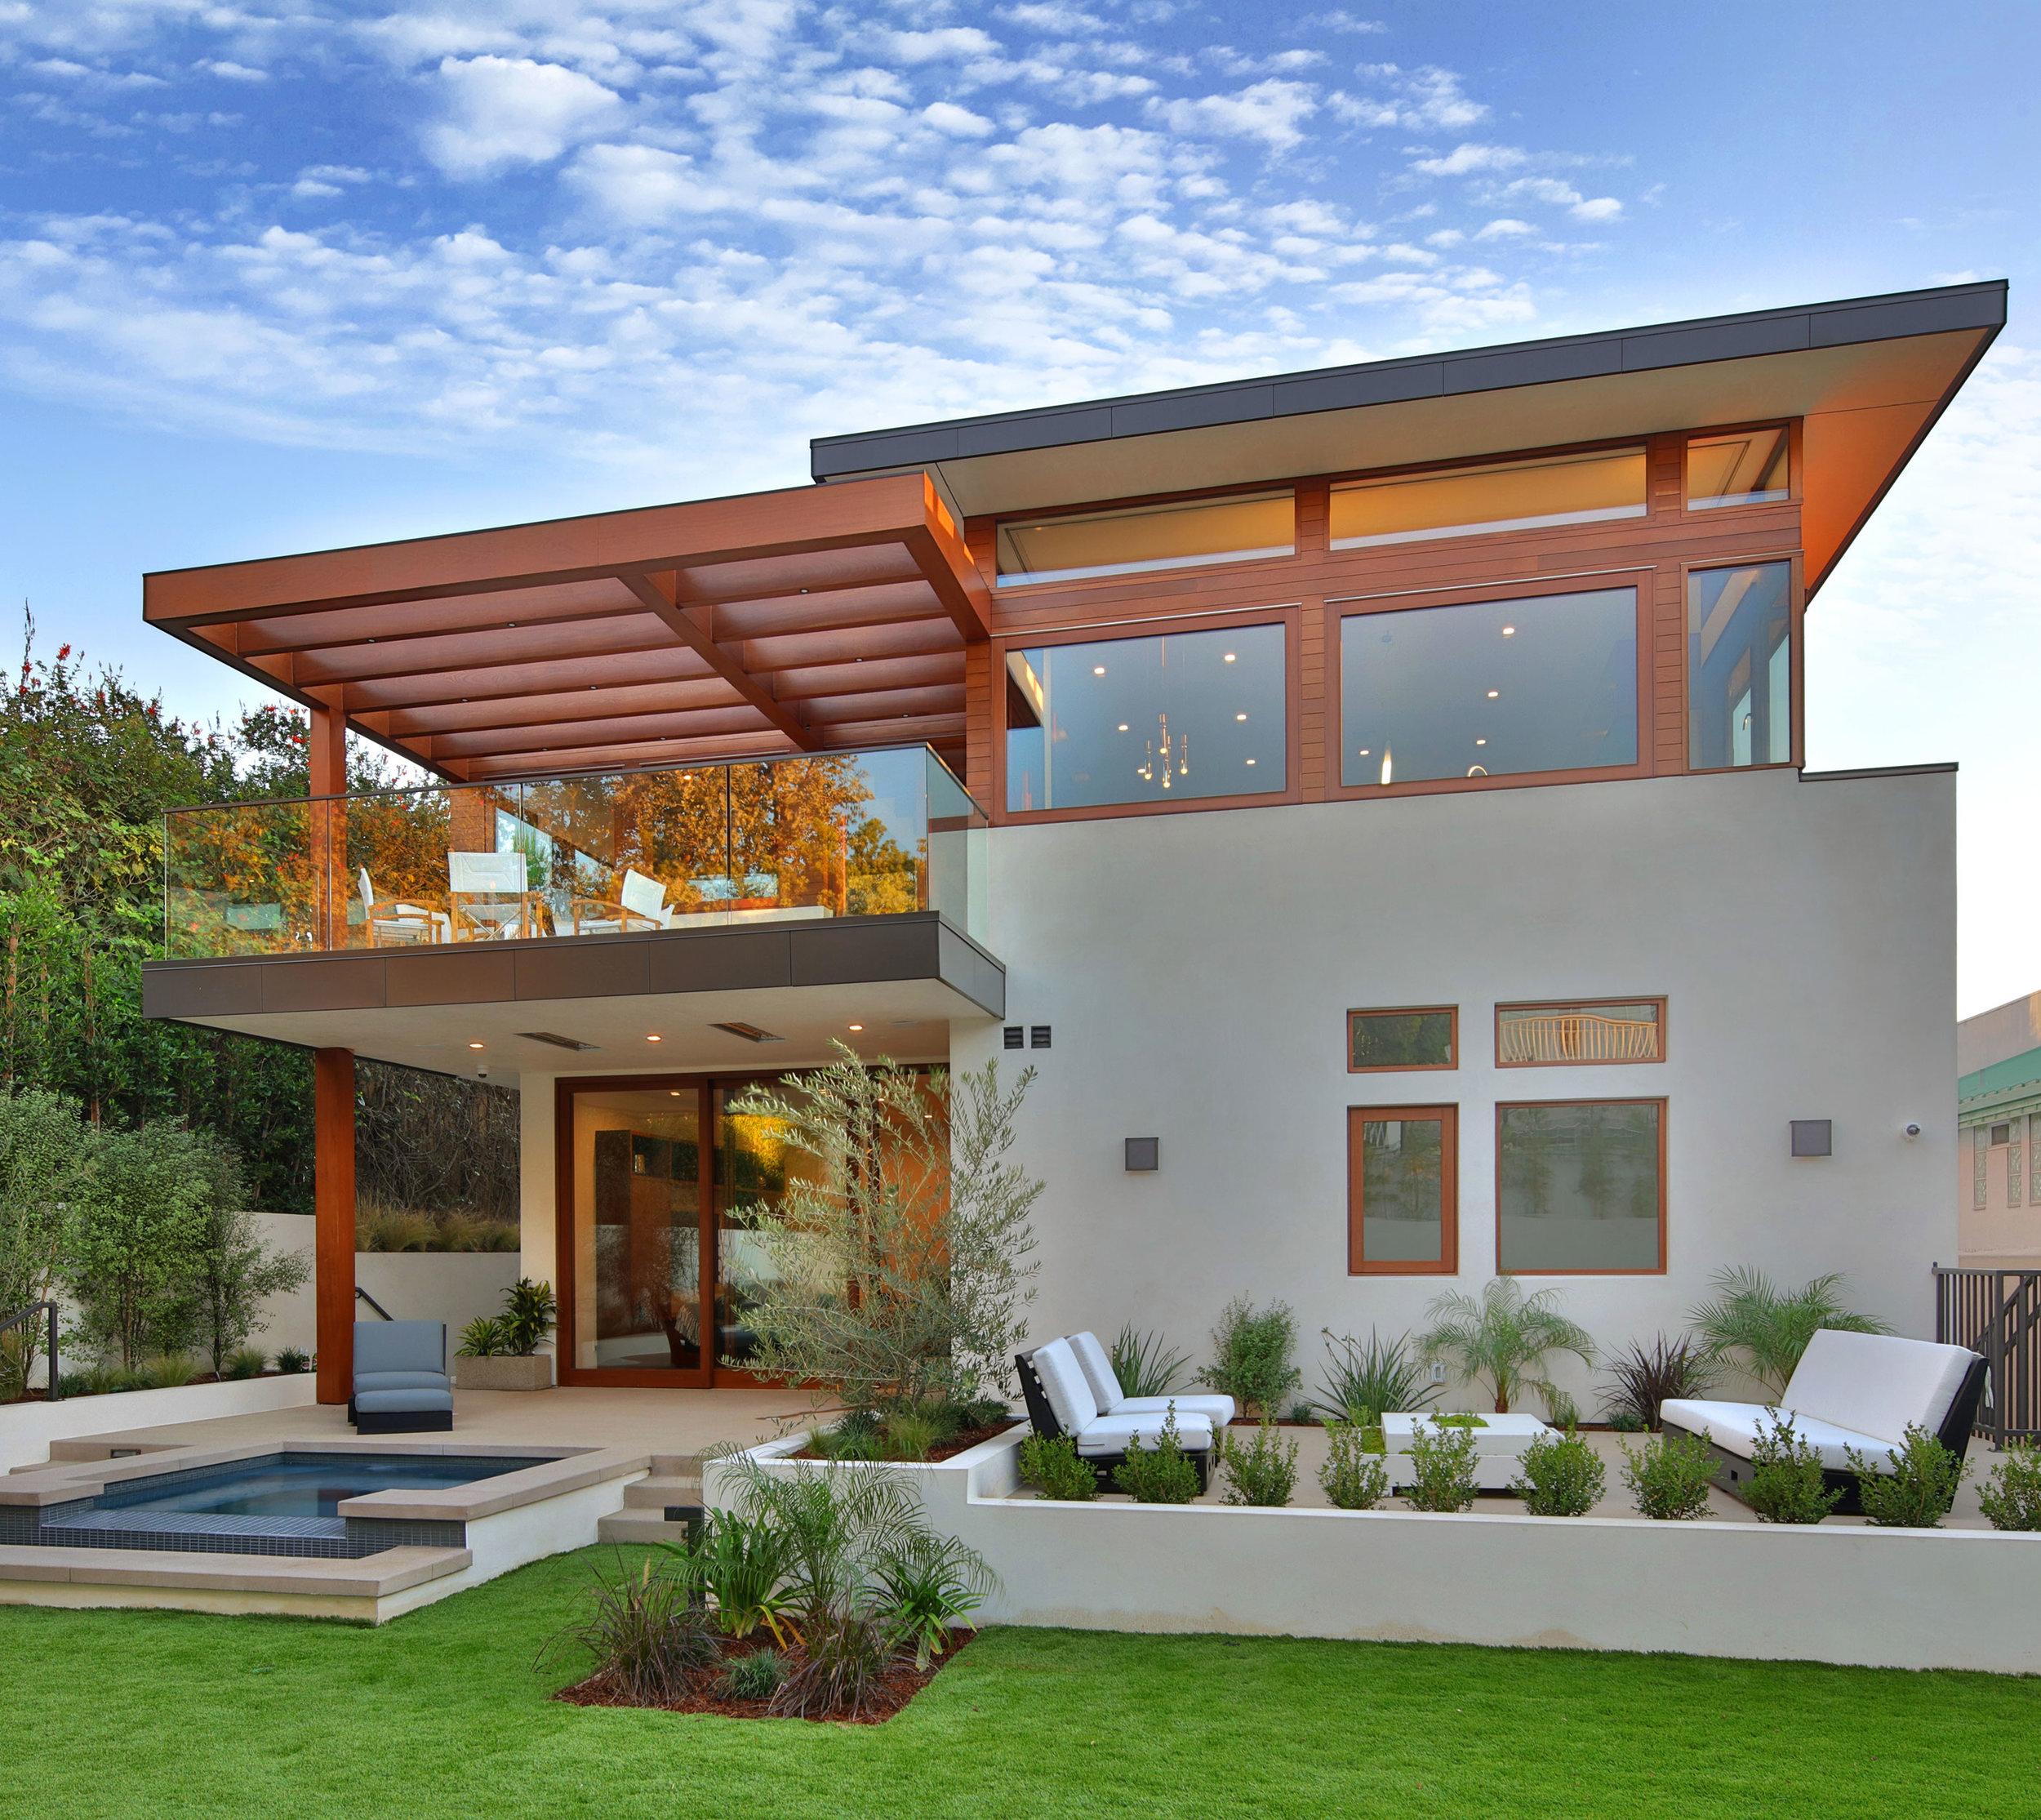 15-contemporary-architecture-los-angeles-backyard-SiliconBay.jpg